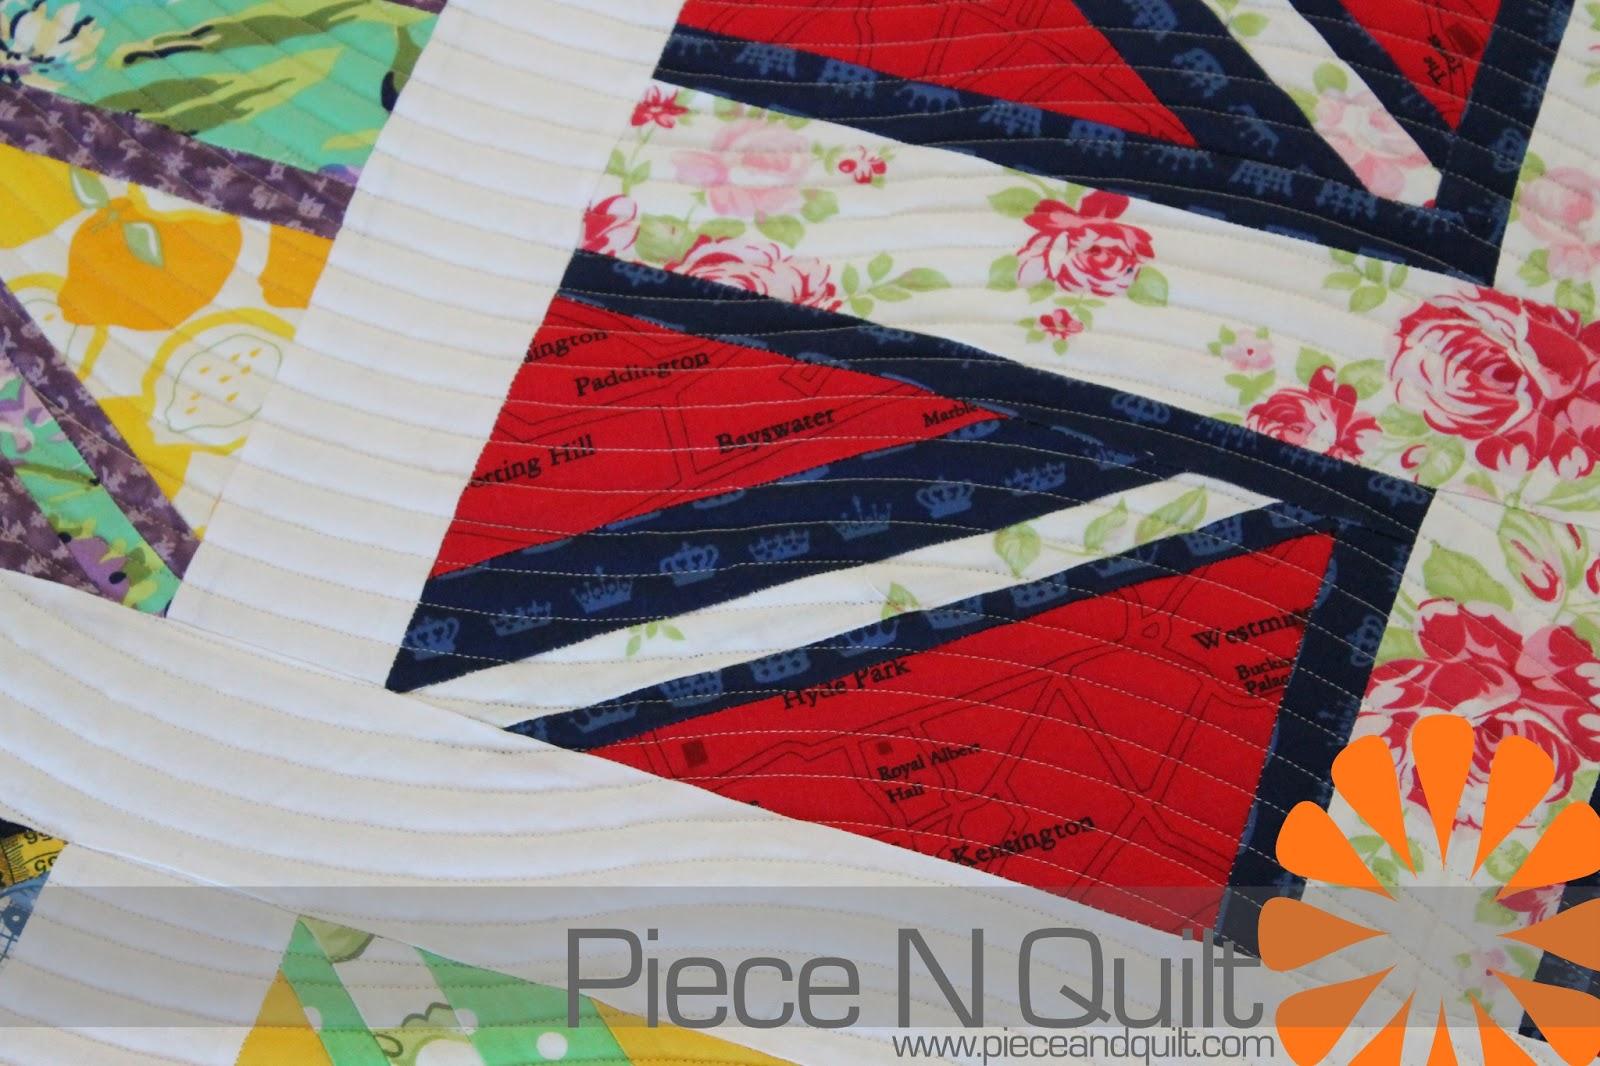 Piece N Quilt: Union Jack Quilt : union jack quilt - Adamdwight.com